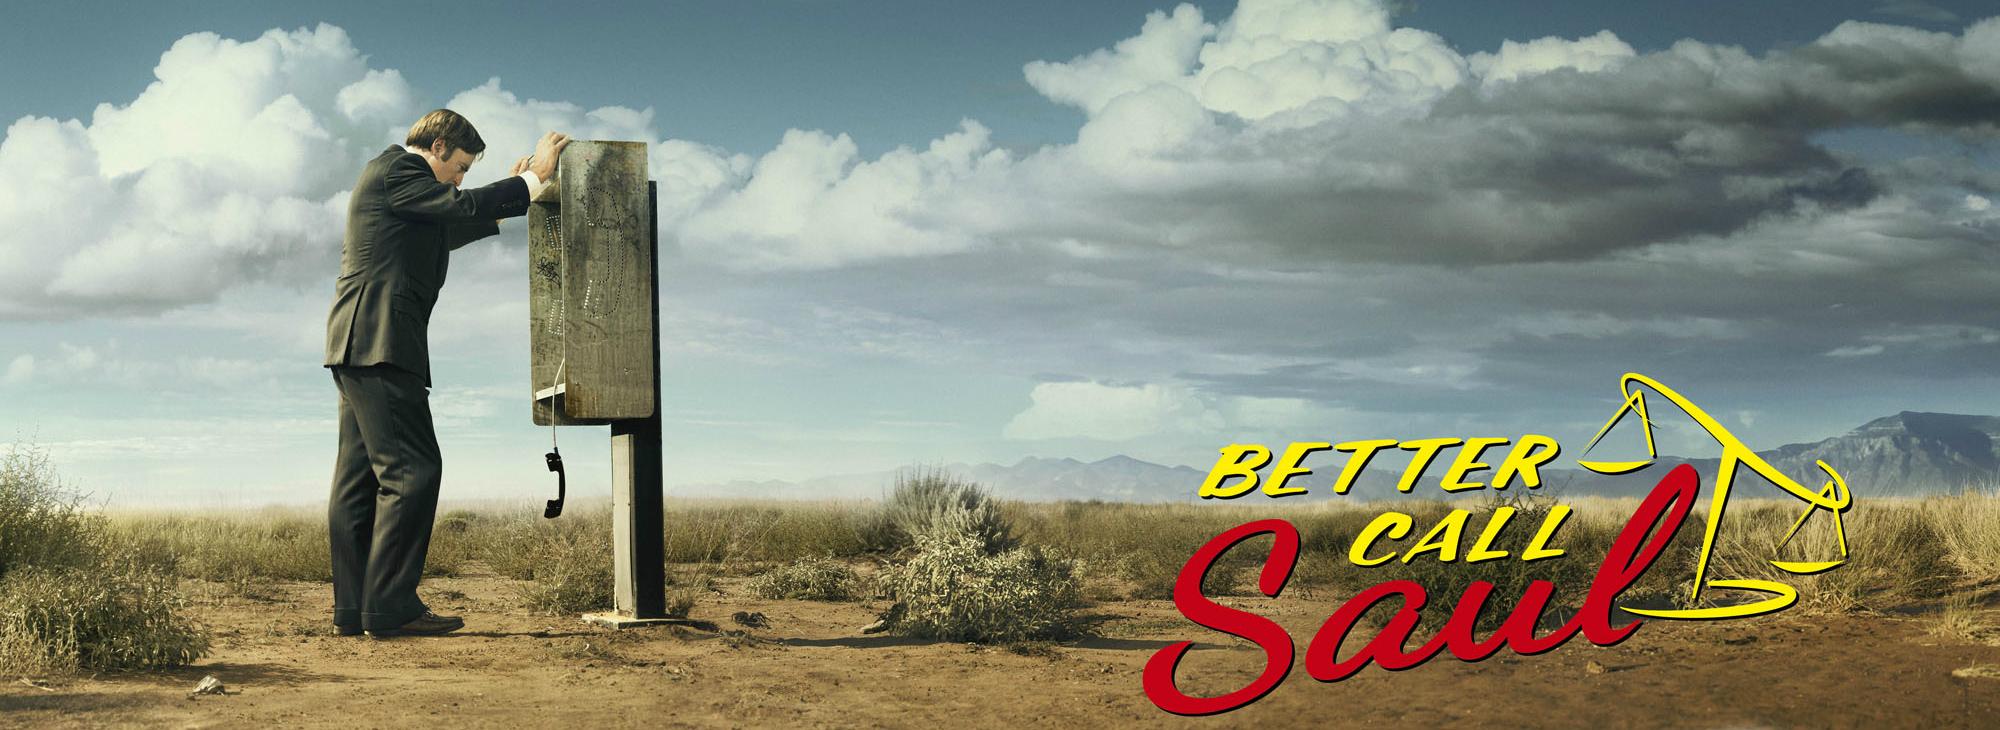 better-call-saul-banner.jpg